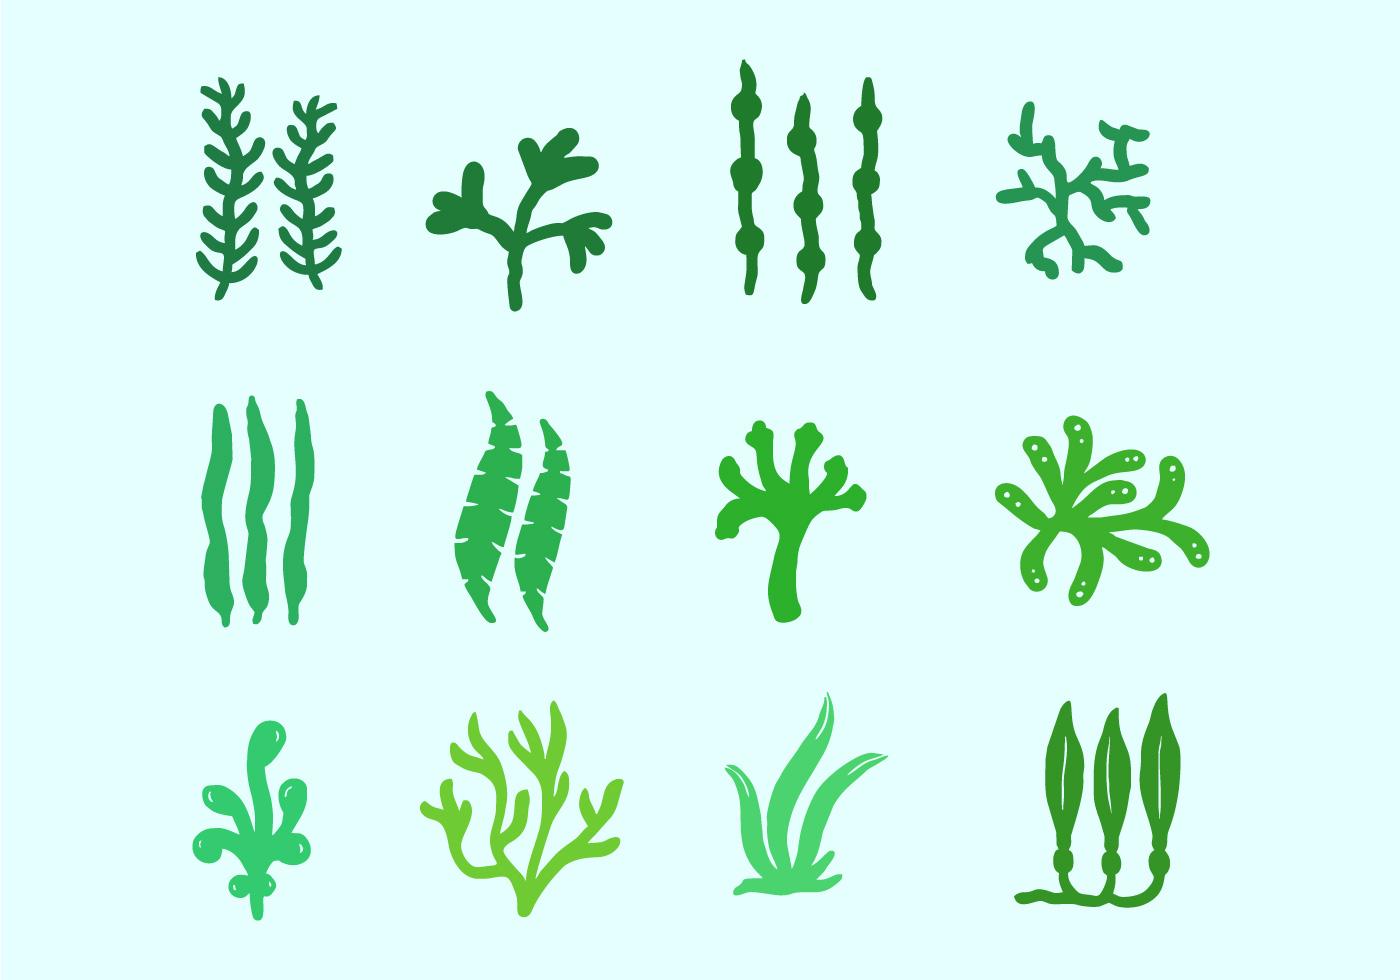 seaweed free vector art 4761 free downloads rh vecteezy com seaweed vector art seaweed vector images